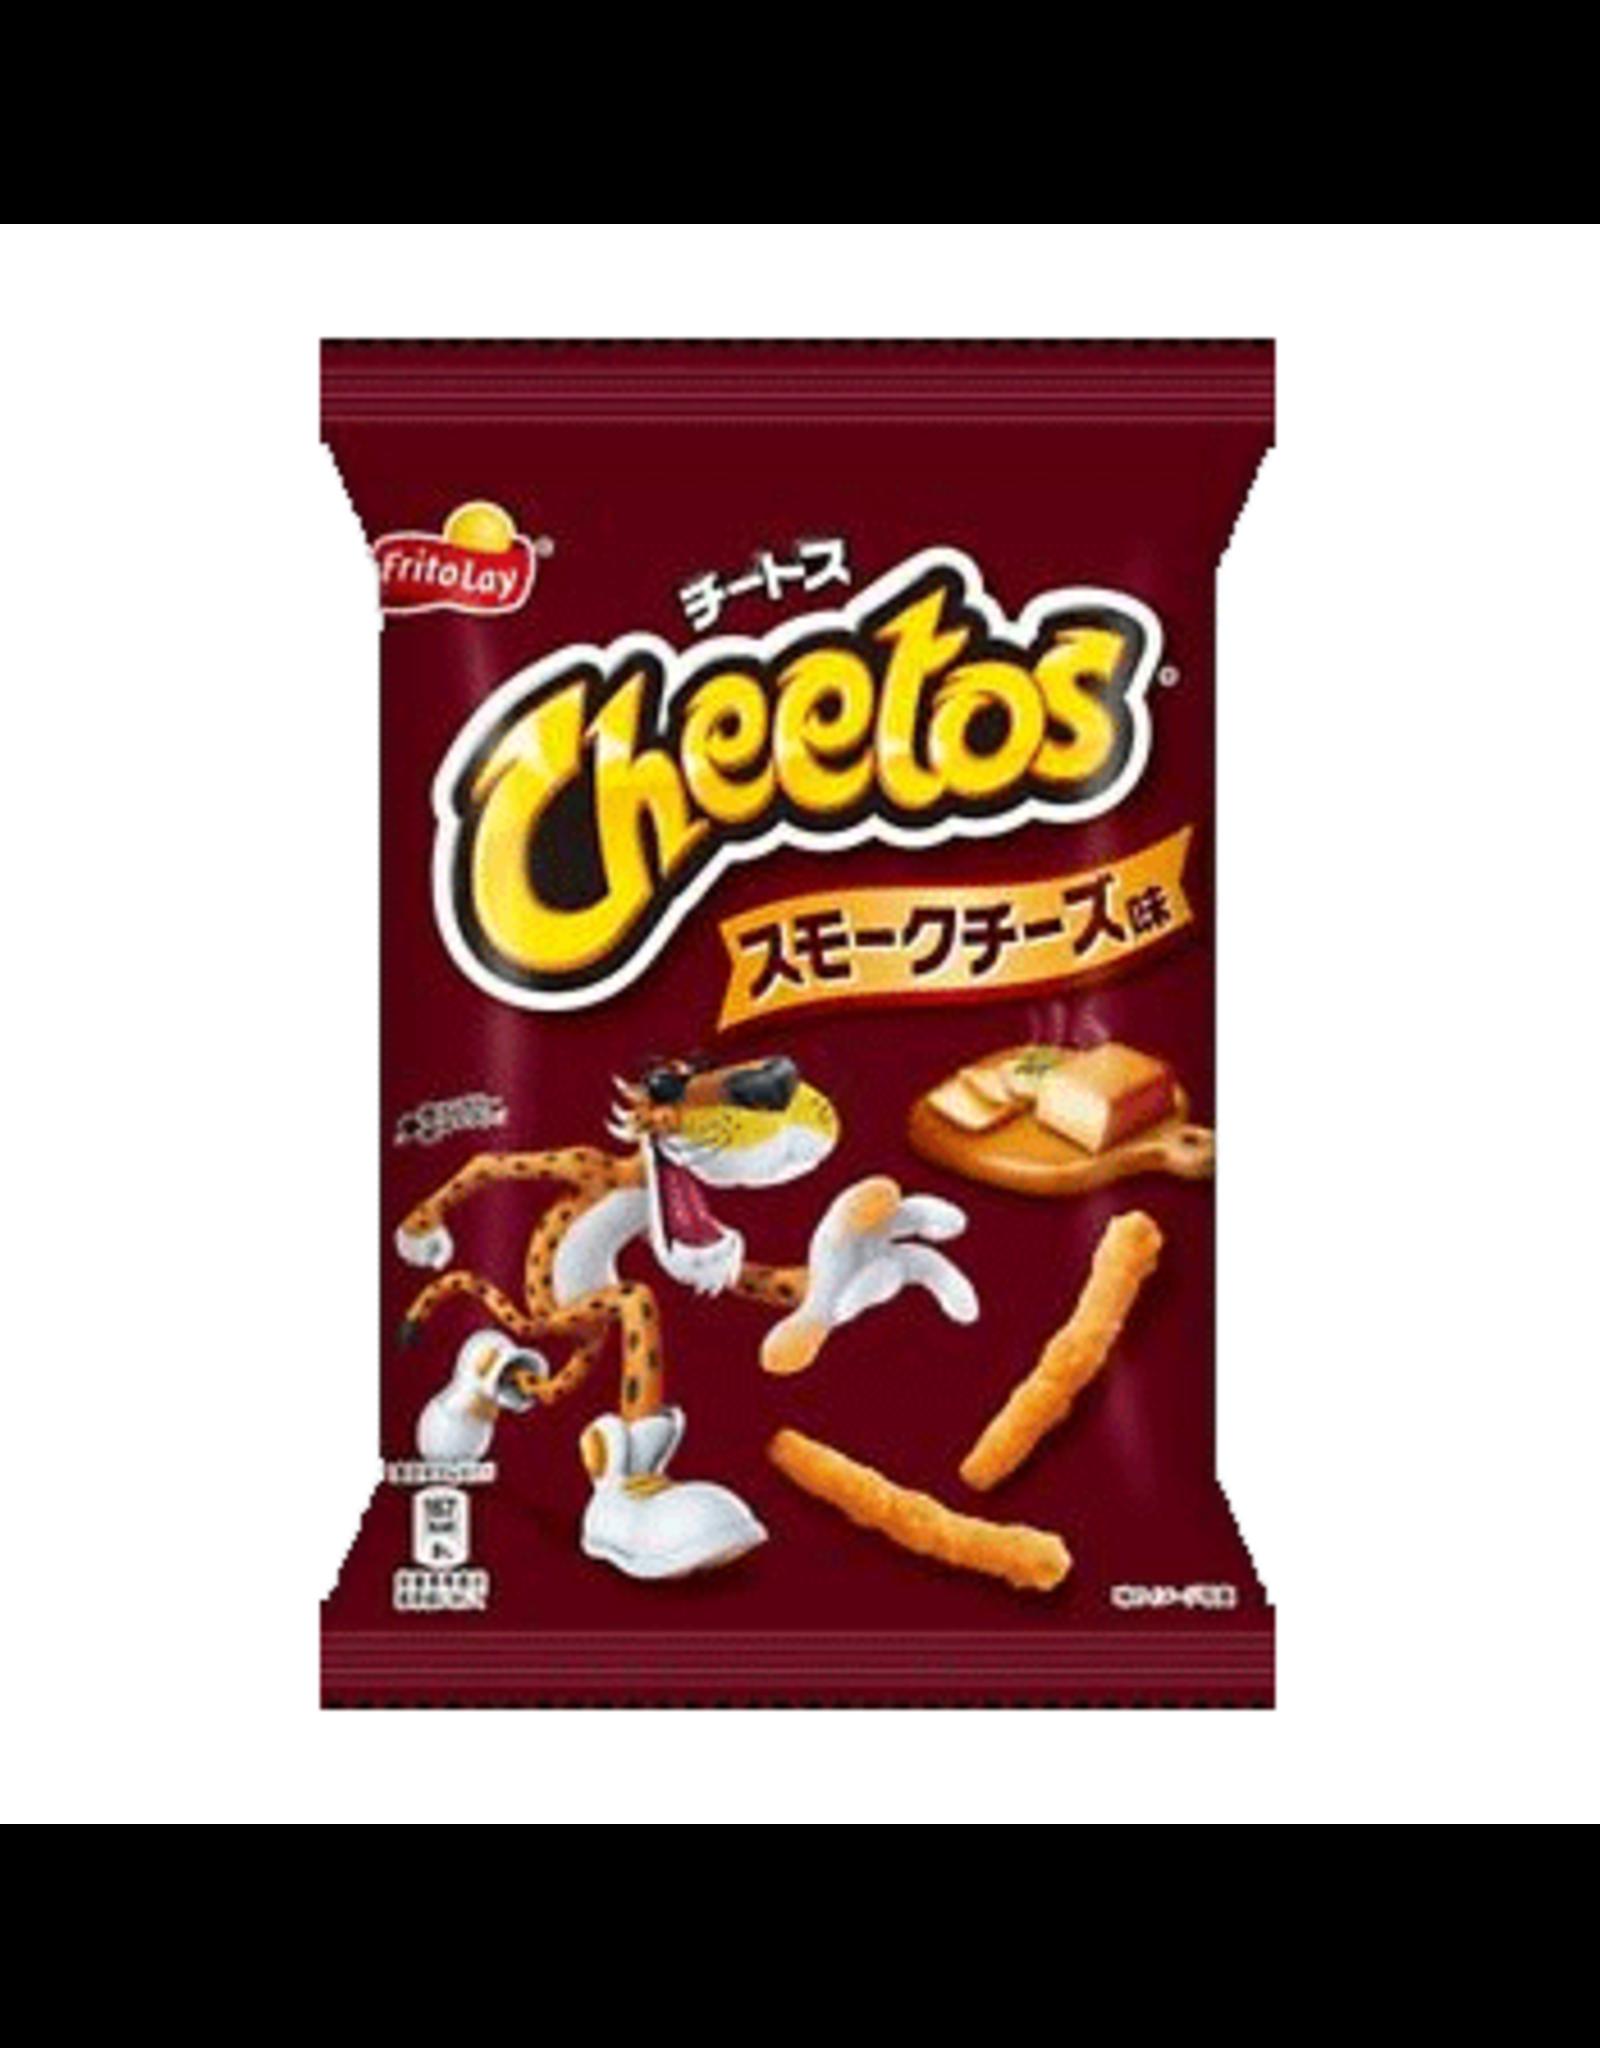 Cheetos Smoked Cheese (Japanese import) - 65g